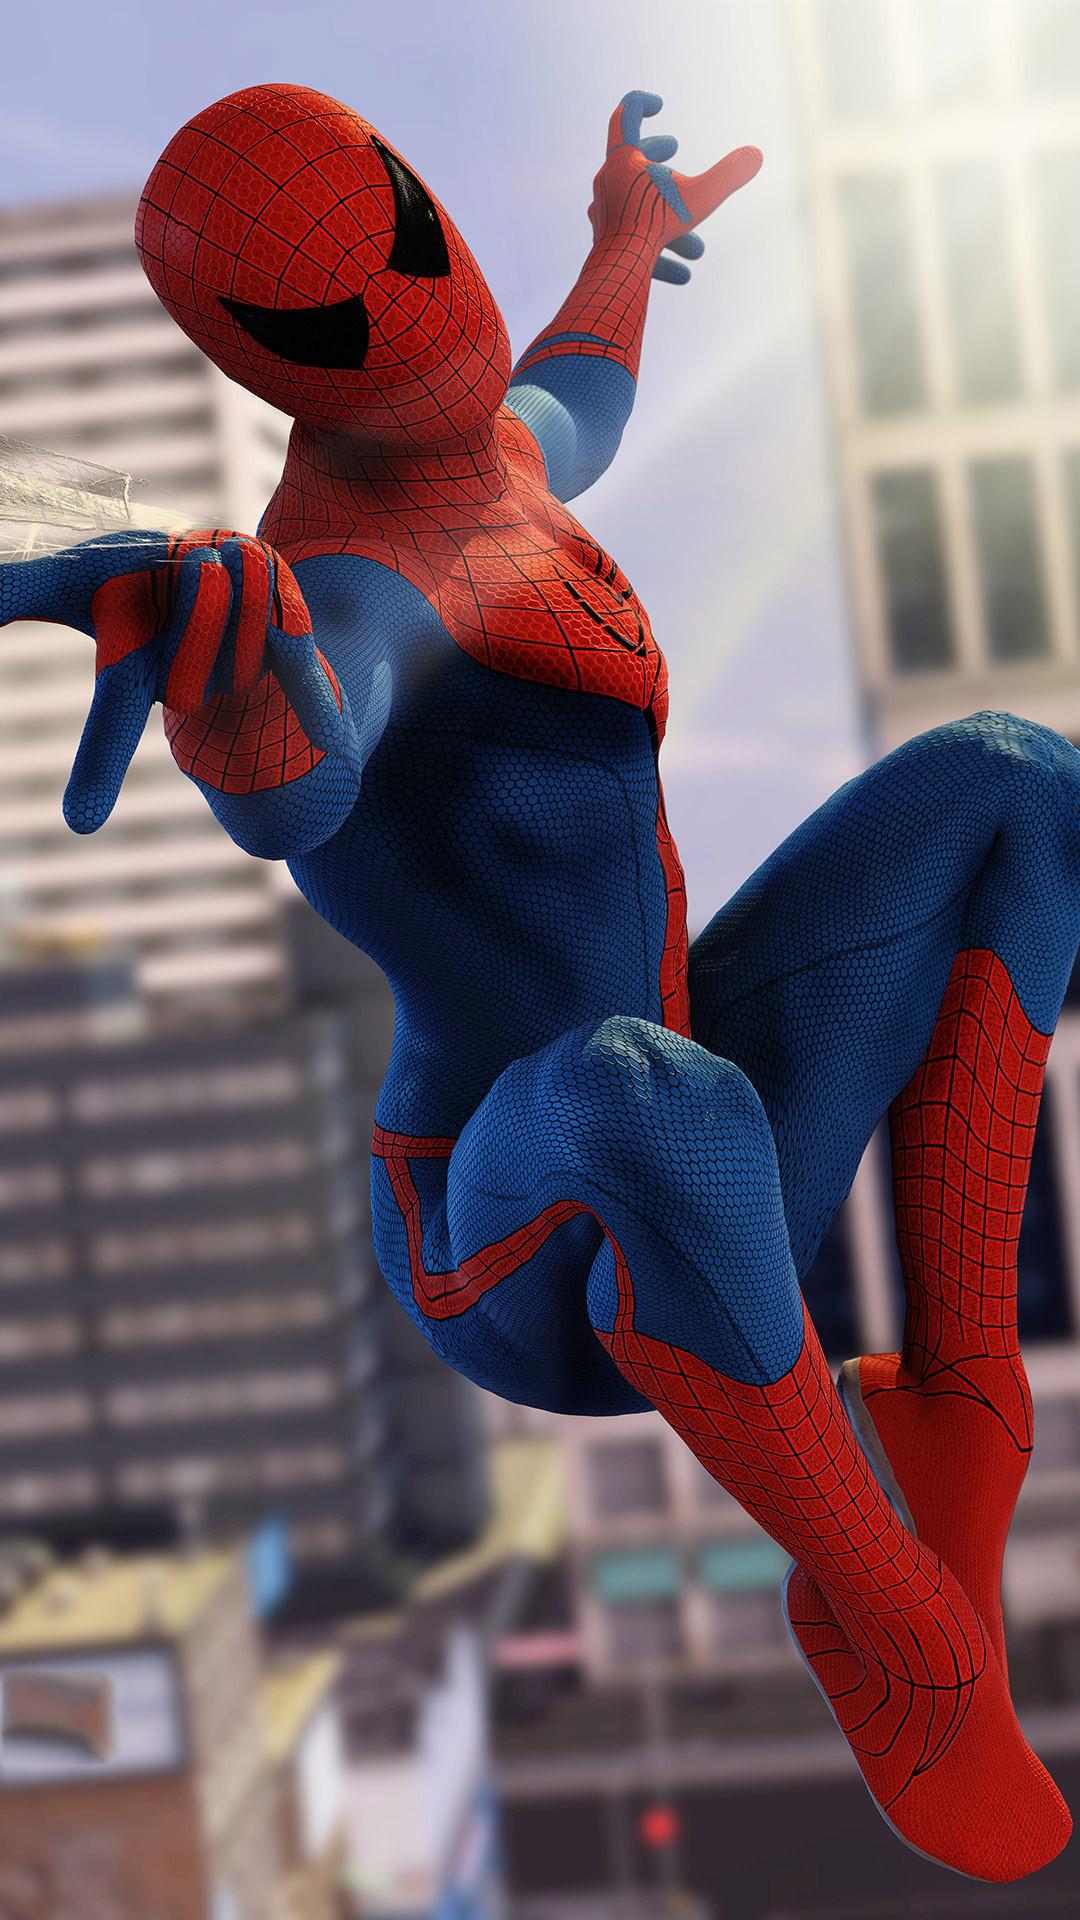 Spider man 2099 wallpaper 78 images - Man wallpaper ...